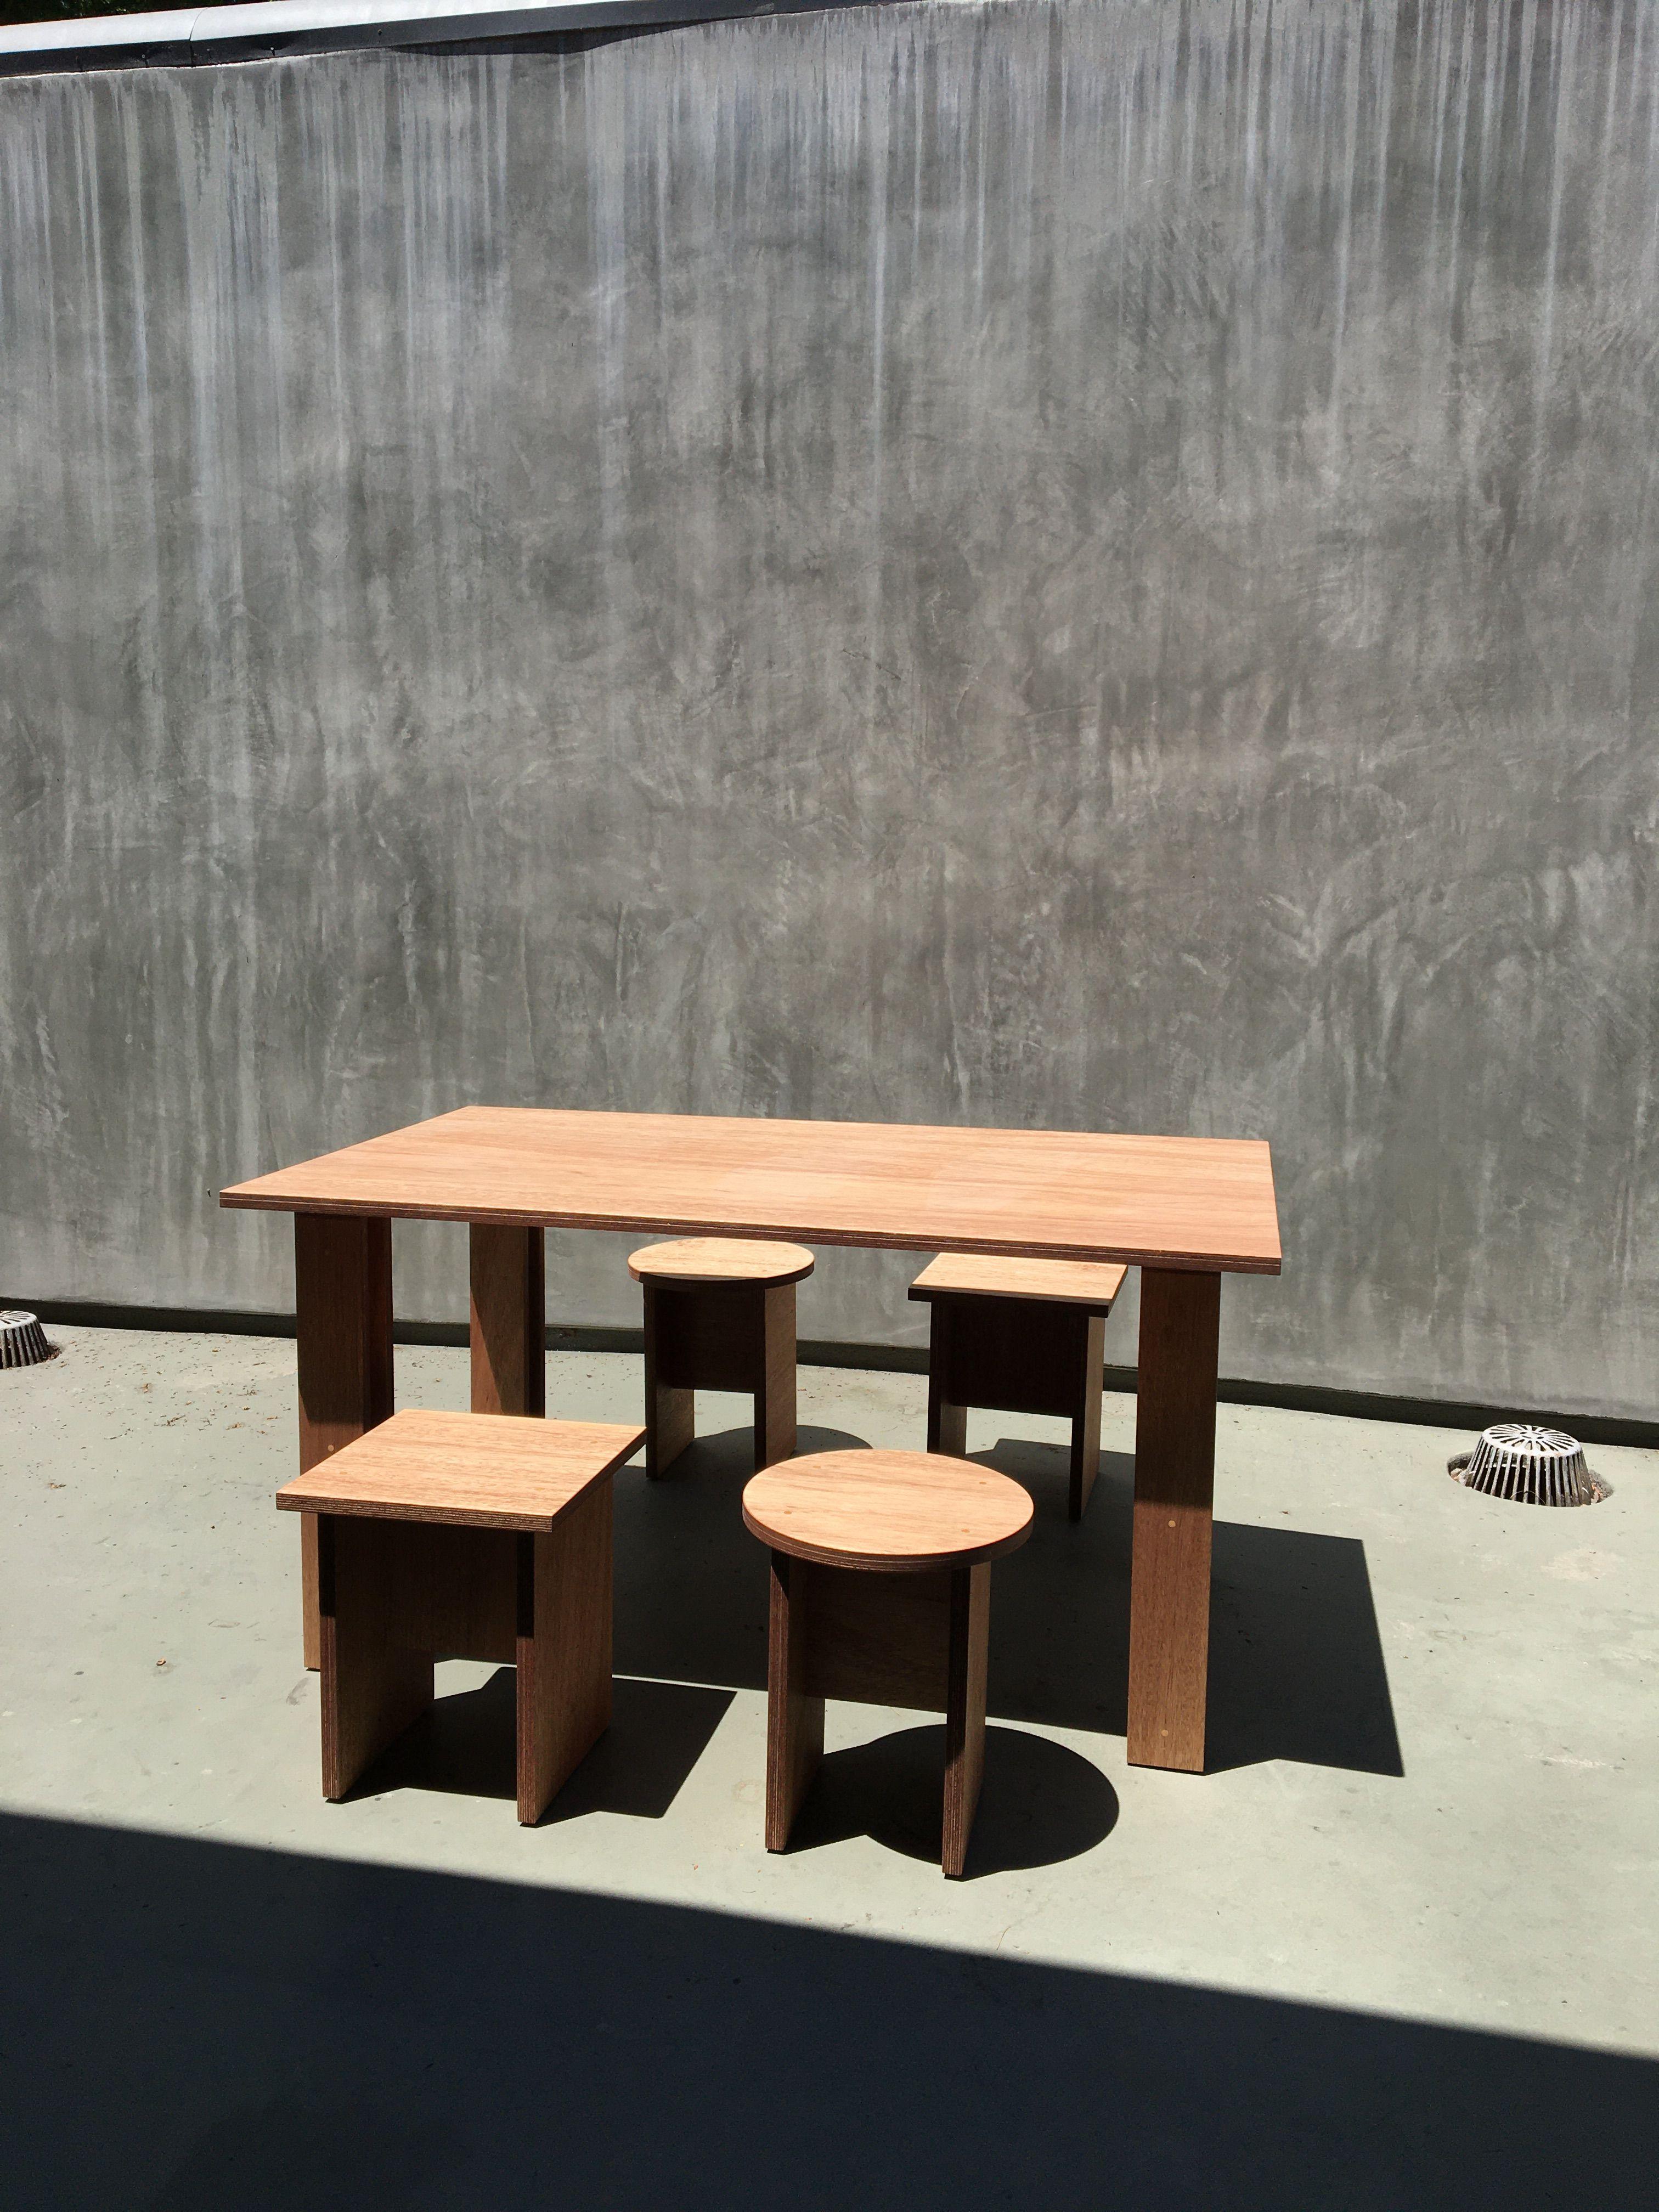 Outdoor I-Beam Set product image 11